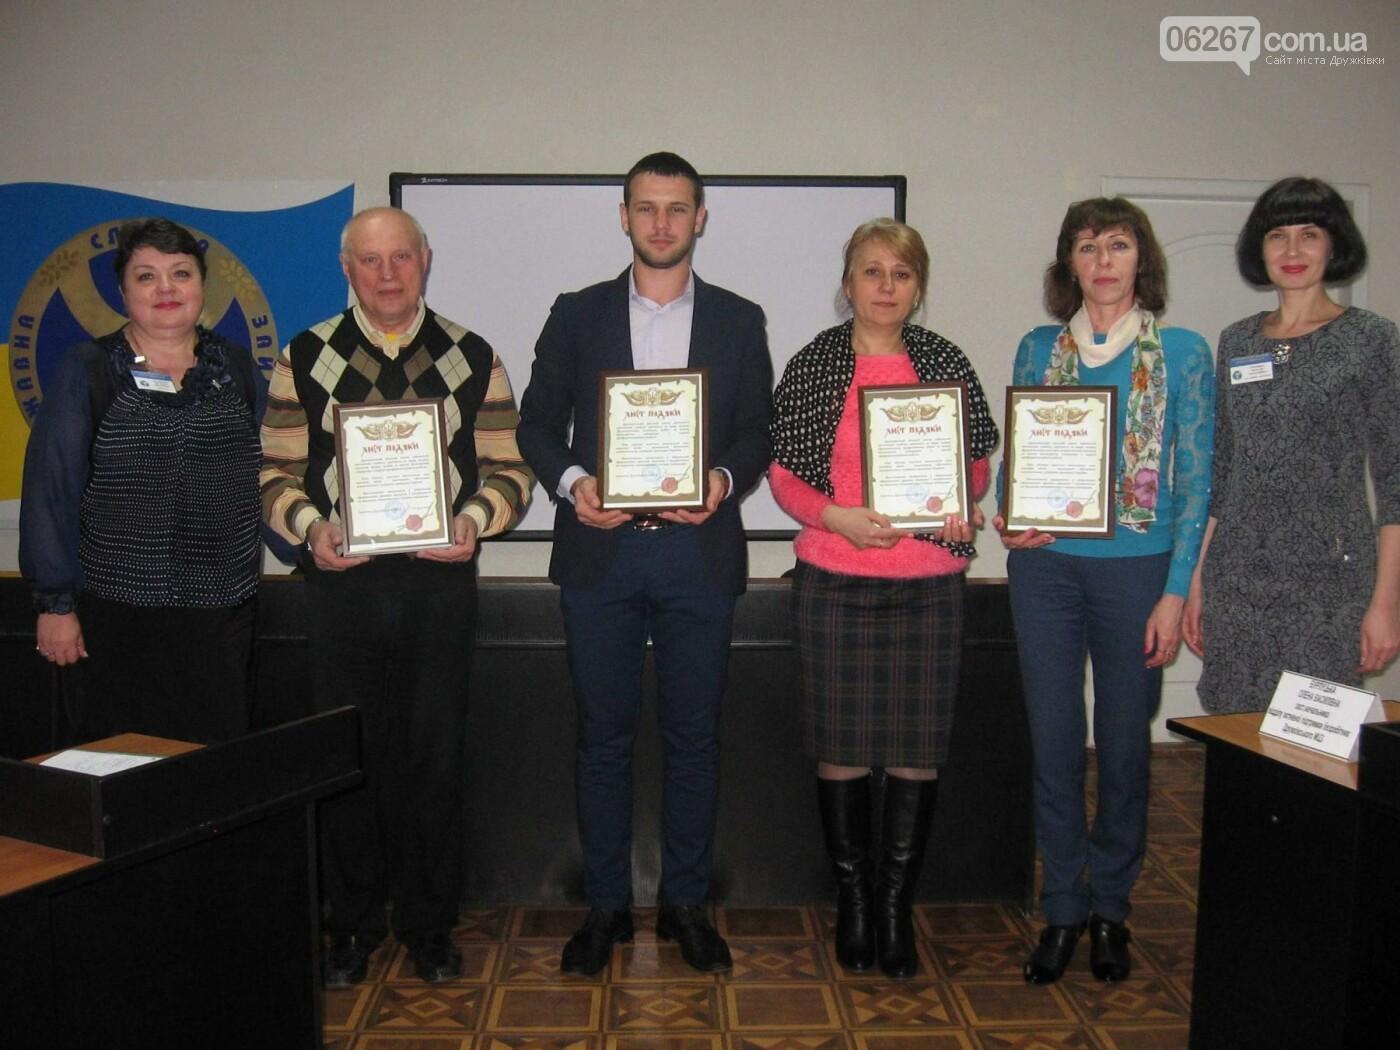 В Дружковке обсудили проблемы профориентации молодежи, фото-1